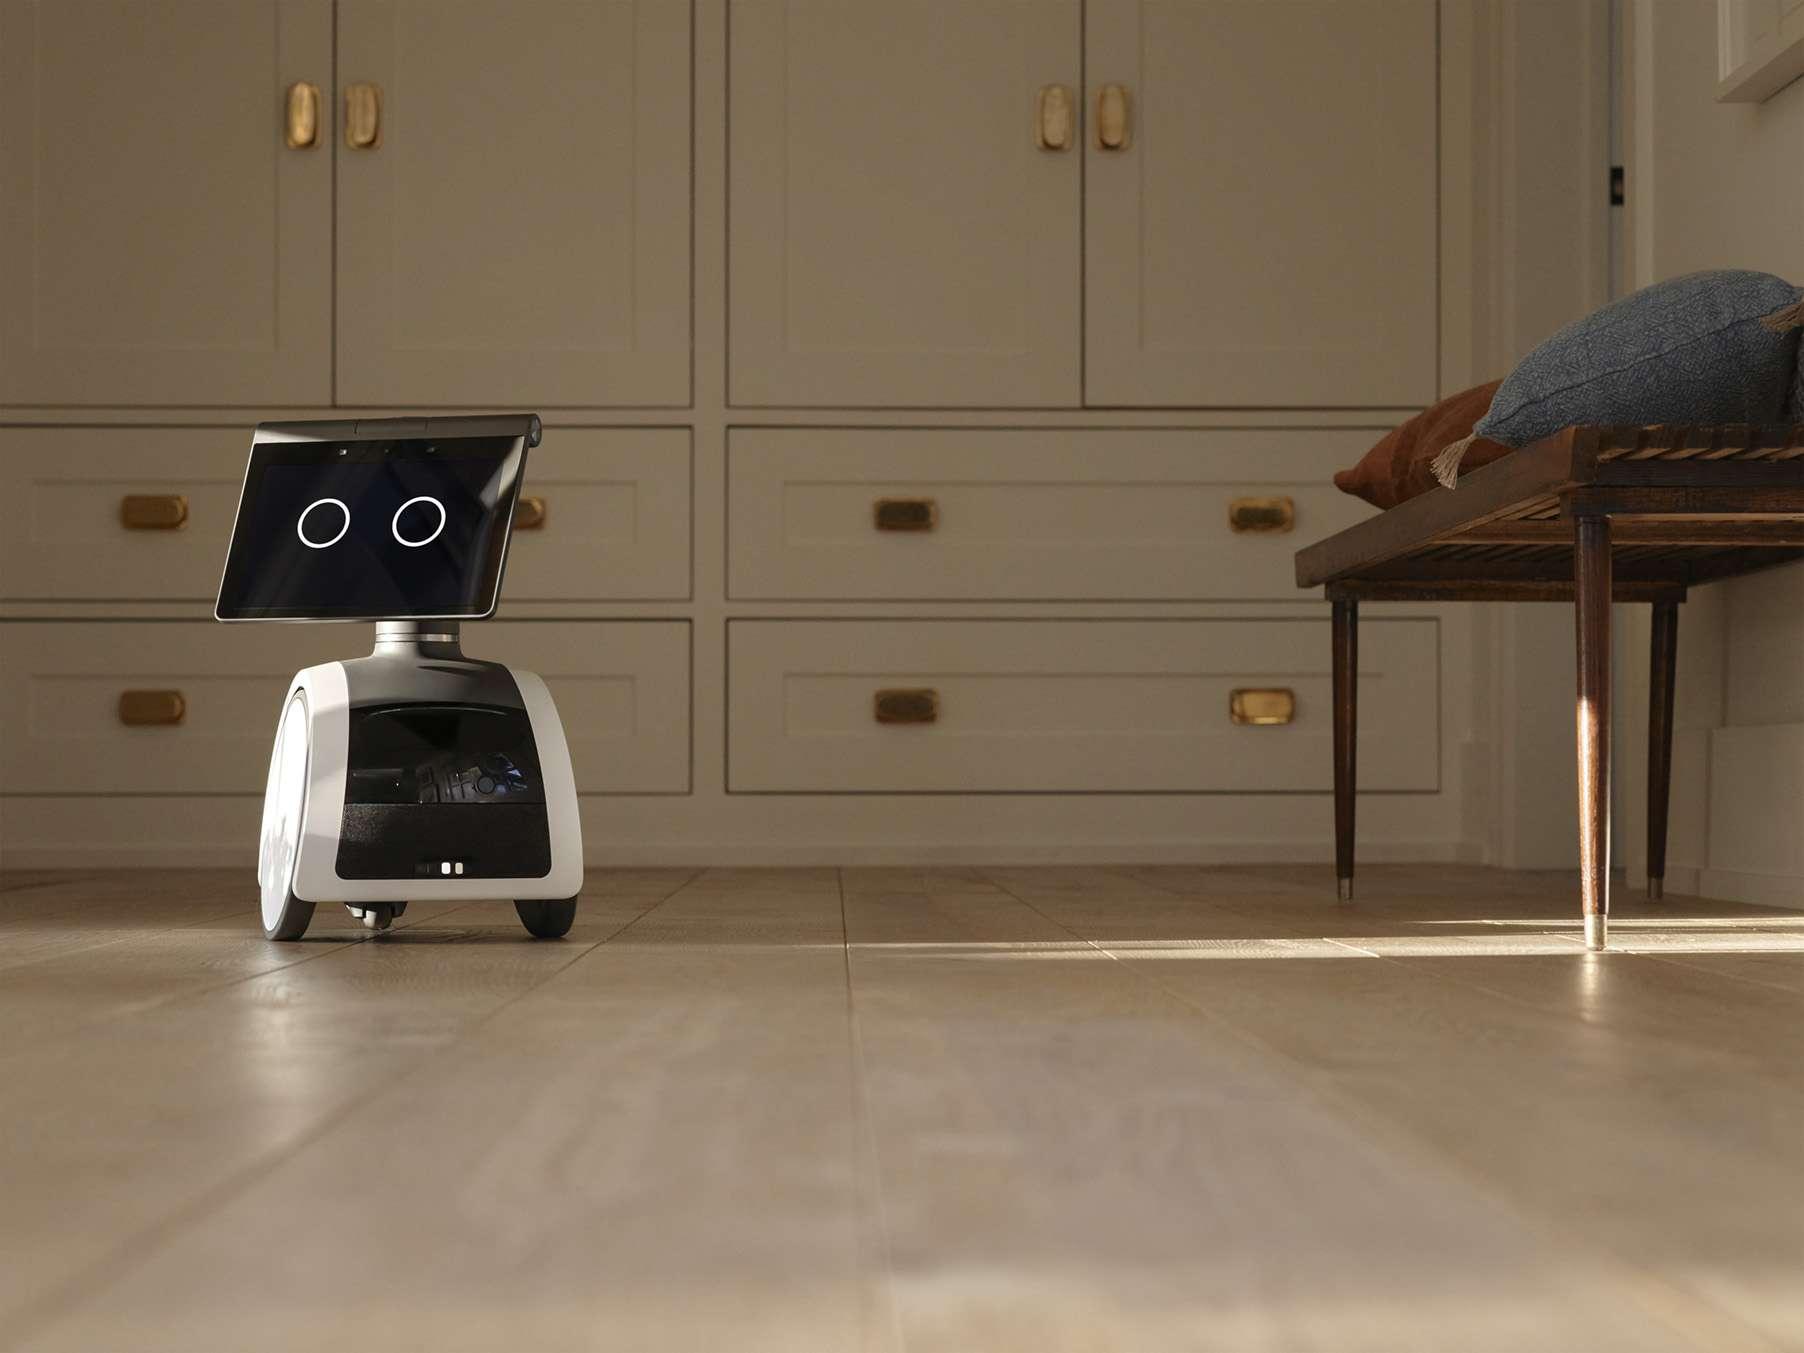 The Amazon Astro robot patrolling a home.